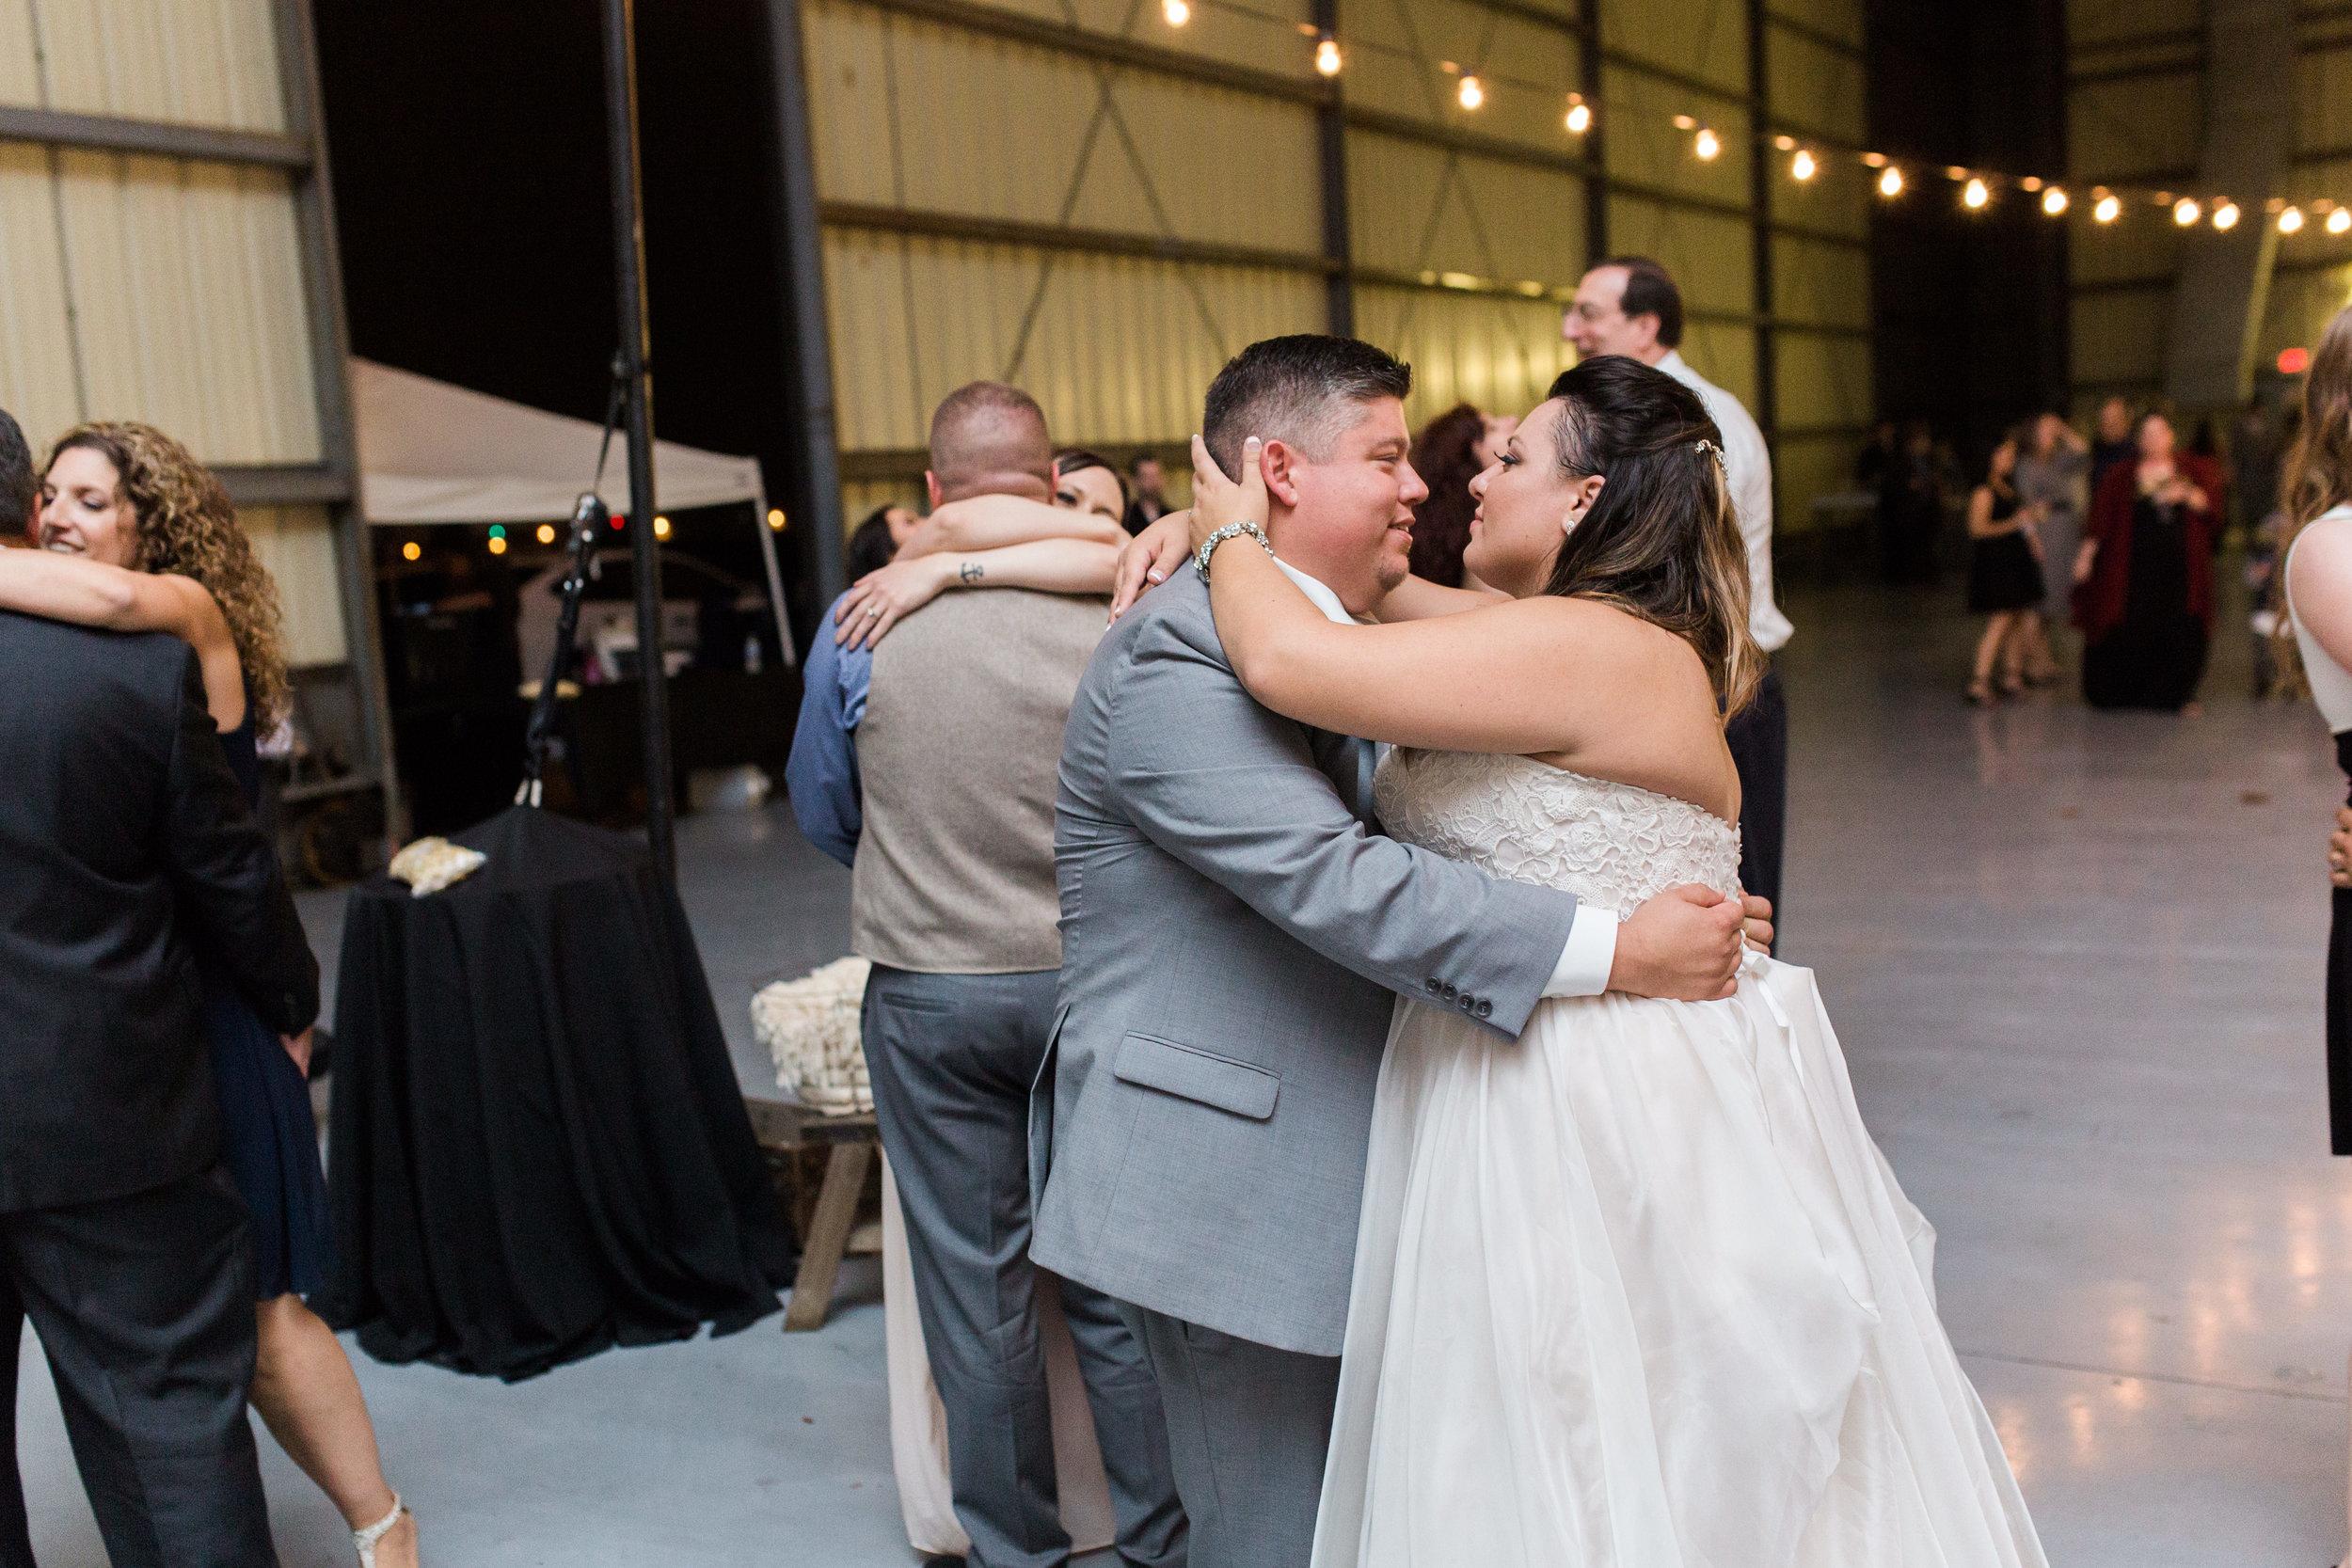 airport-hanger-wedding-at-attitude-aviation-in-livermore-130.jpg